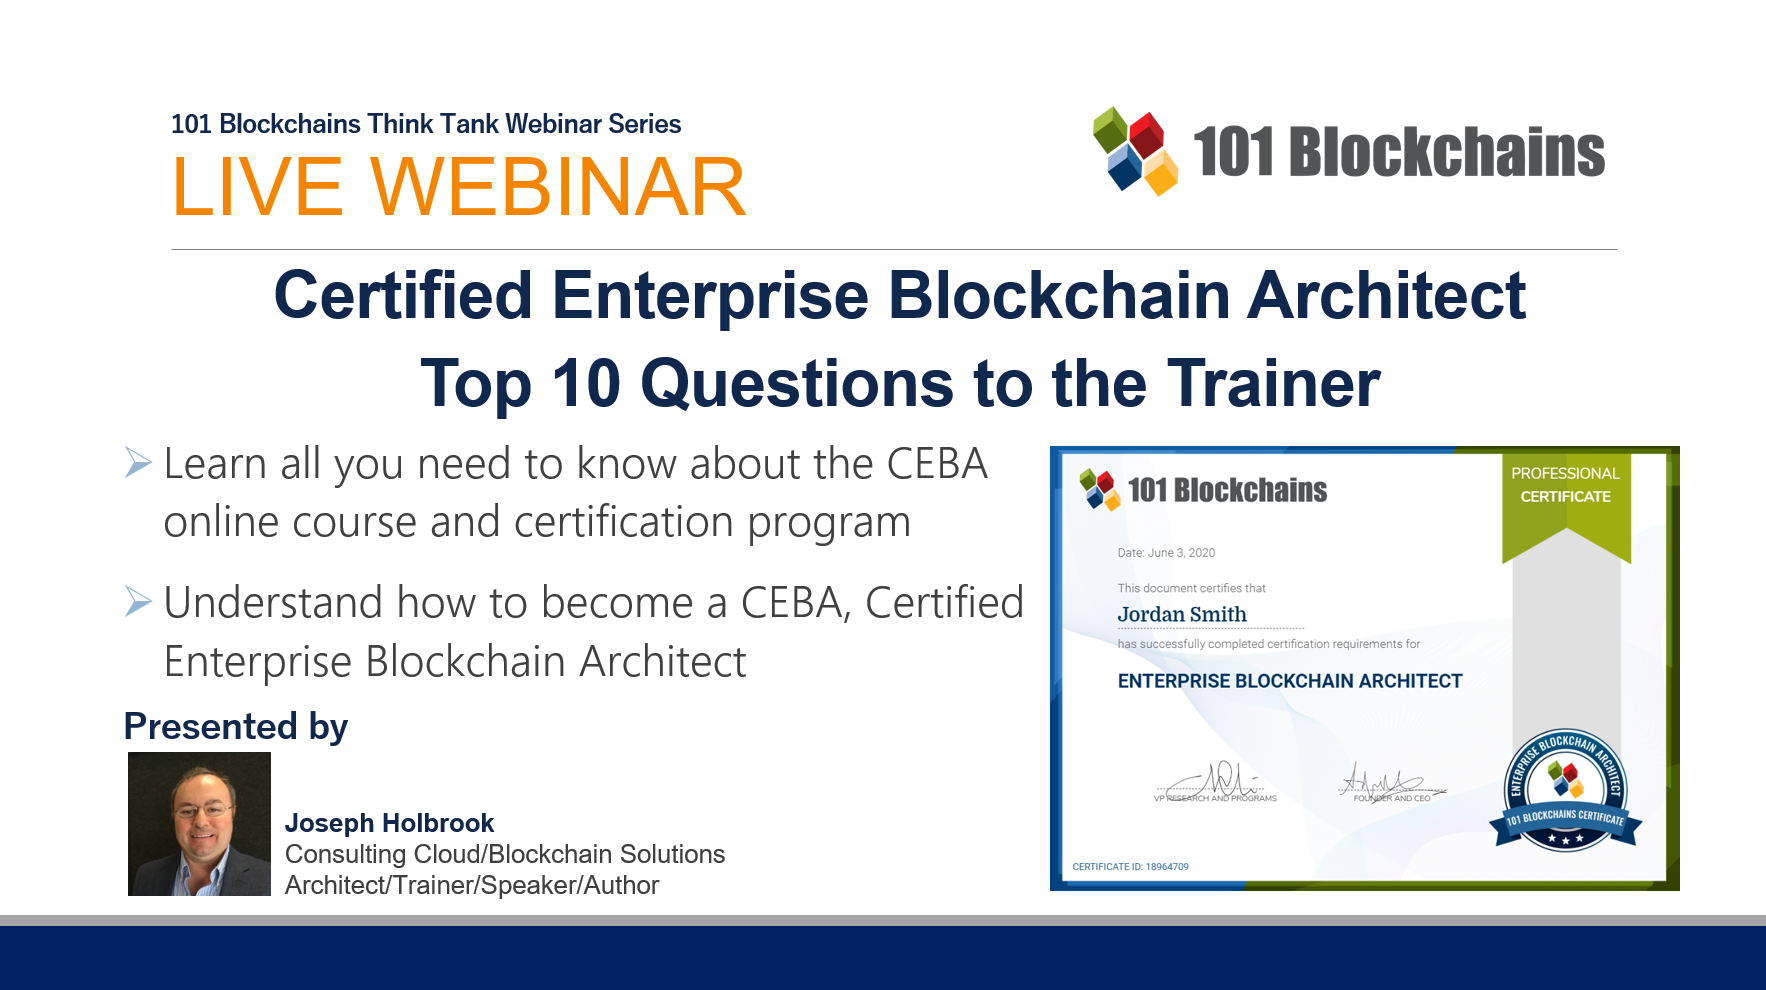 ceba the certified enterprise blockchain architect webinar